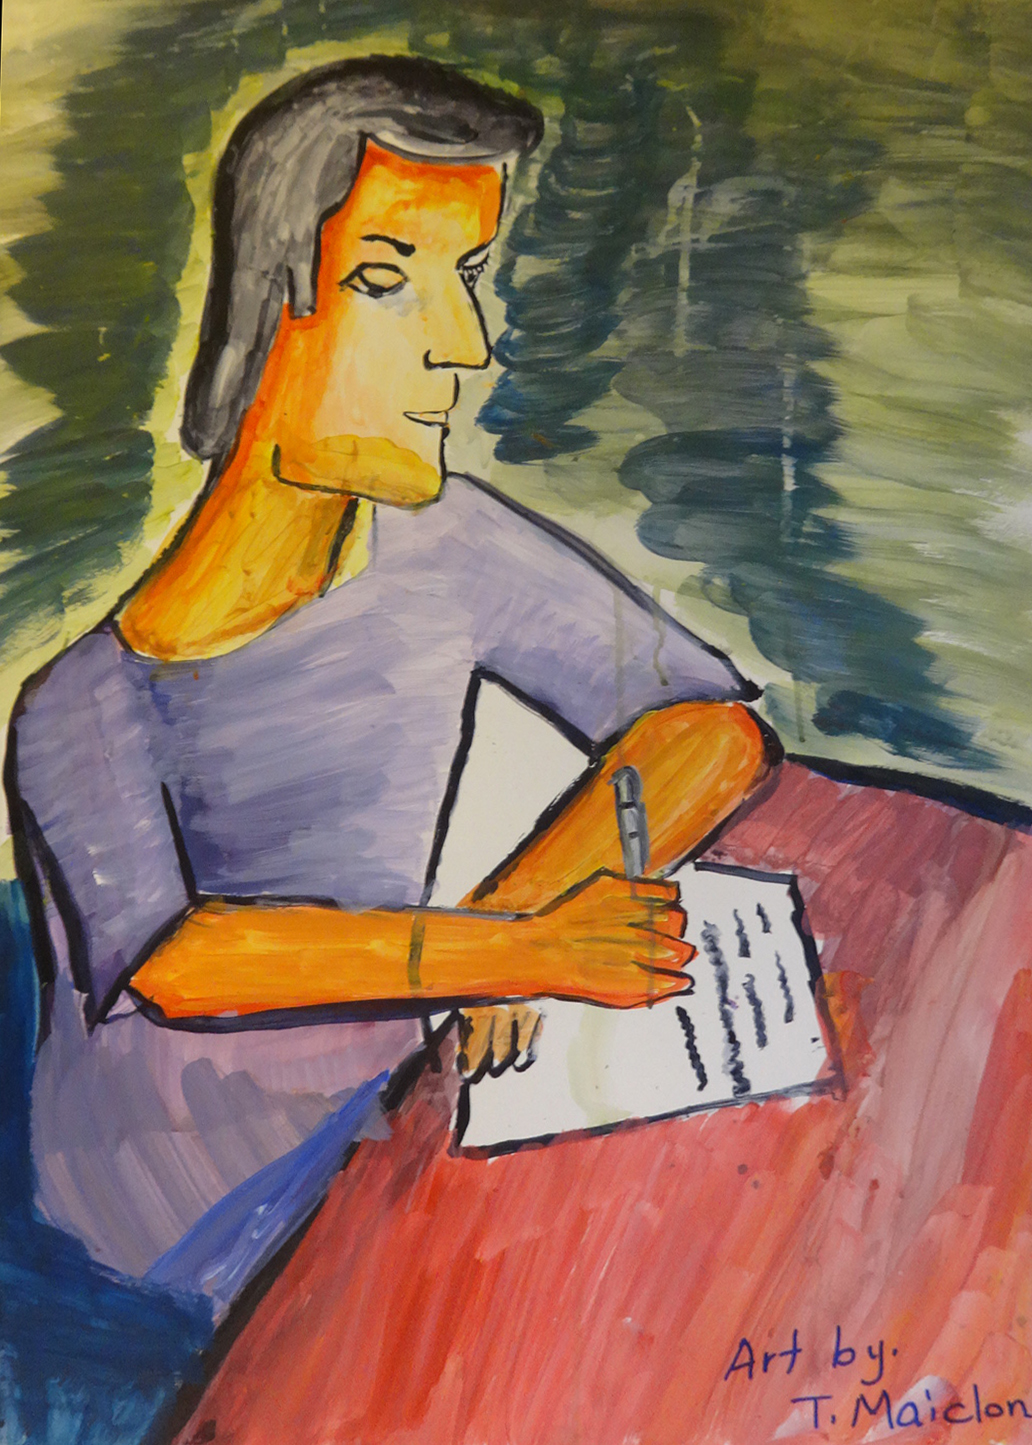 """Writing the letter"" - T. Maiclon, Sri Lanka"